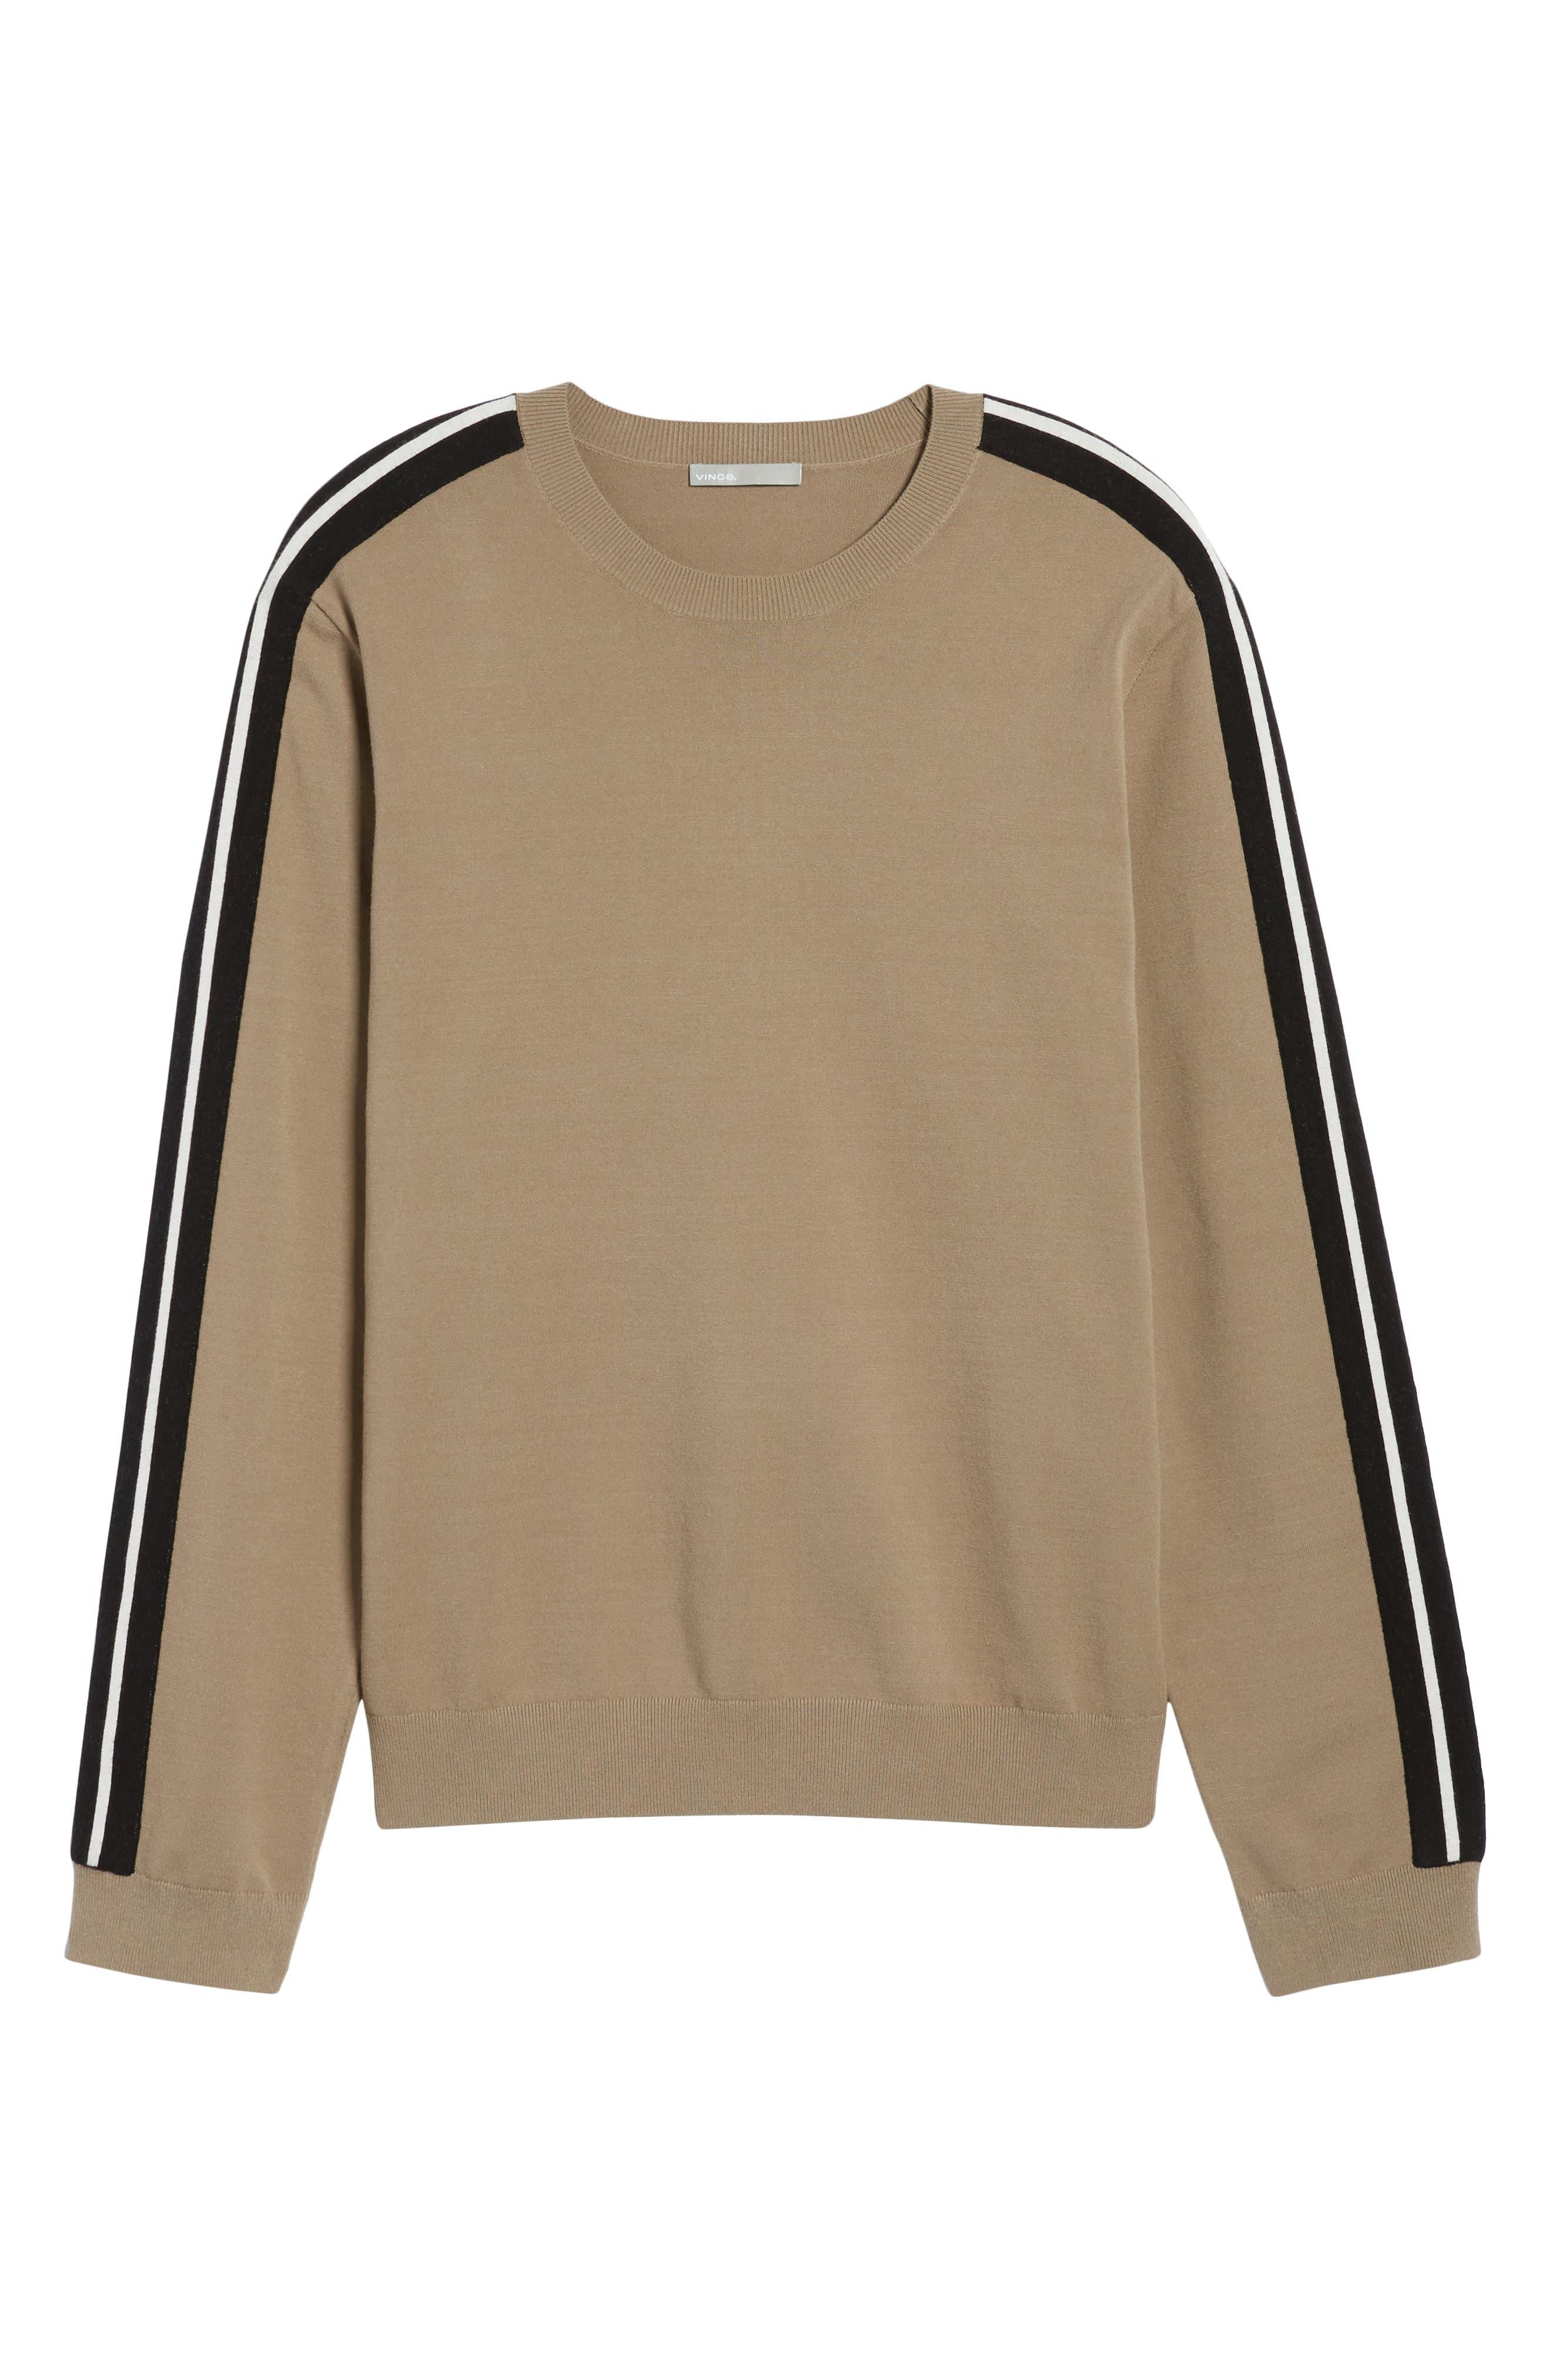 Track Stripe Crewneck Sweater,                             Alternate thumbnail 7, color,                             Pebble Taupe